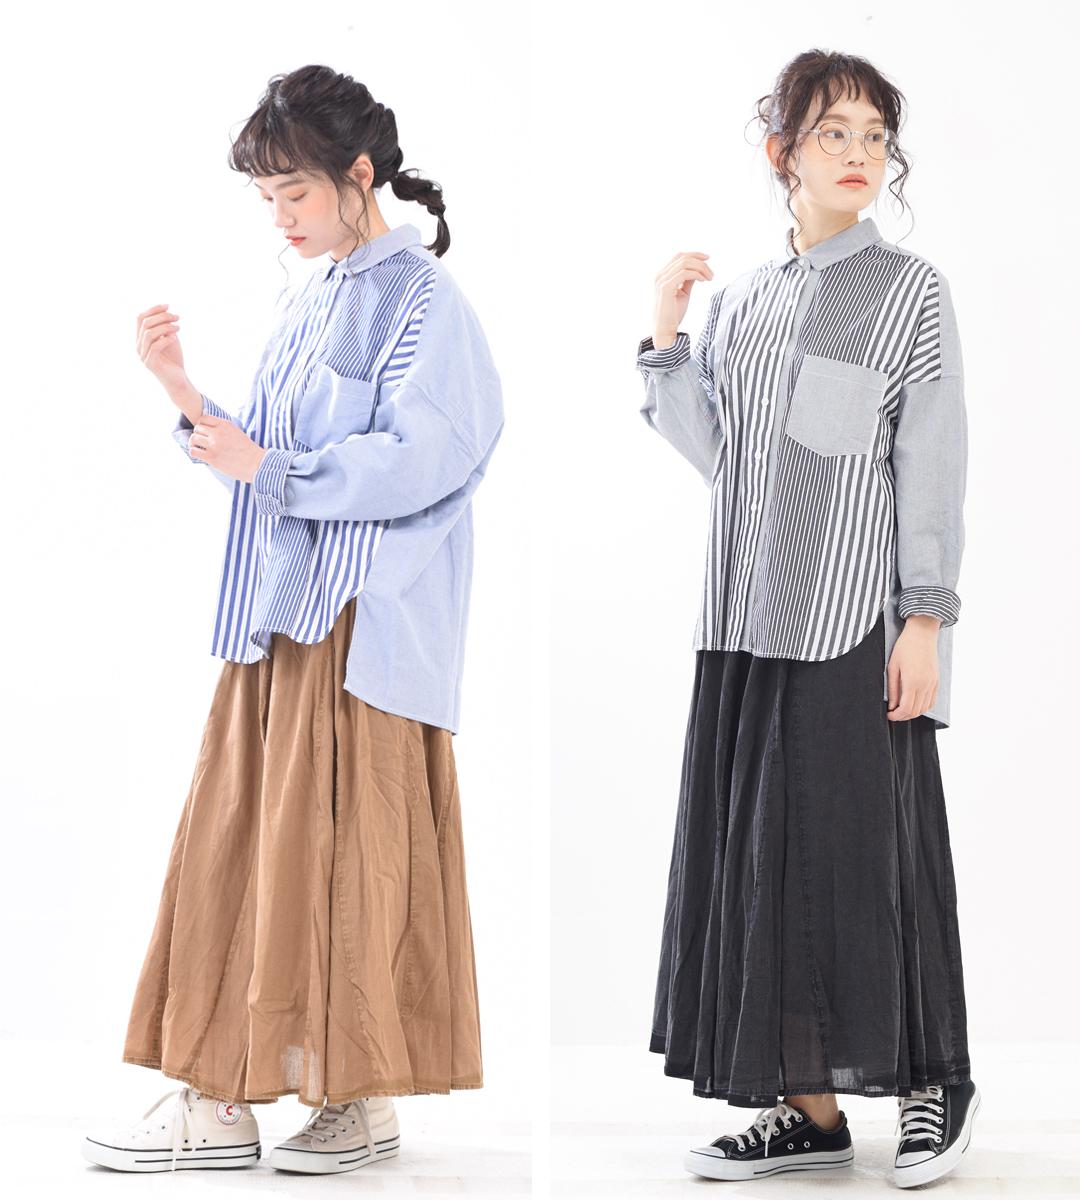 cd5a33d5776 Indian Cotton Skirts And Tops   Saddha